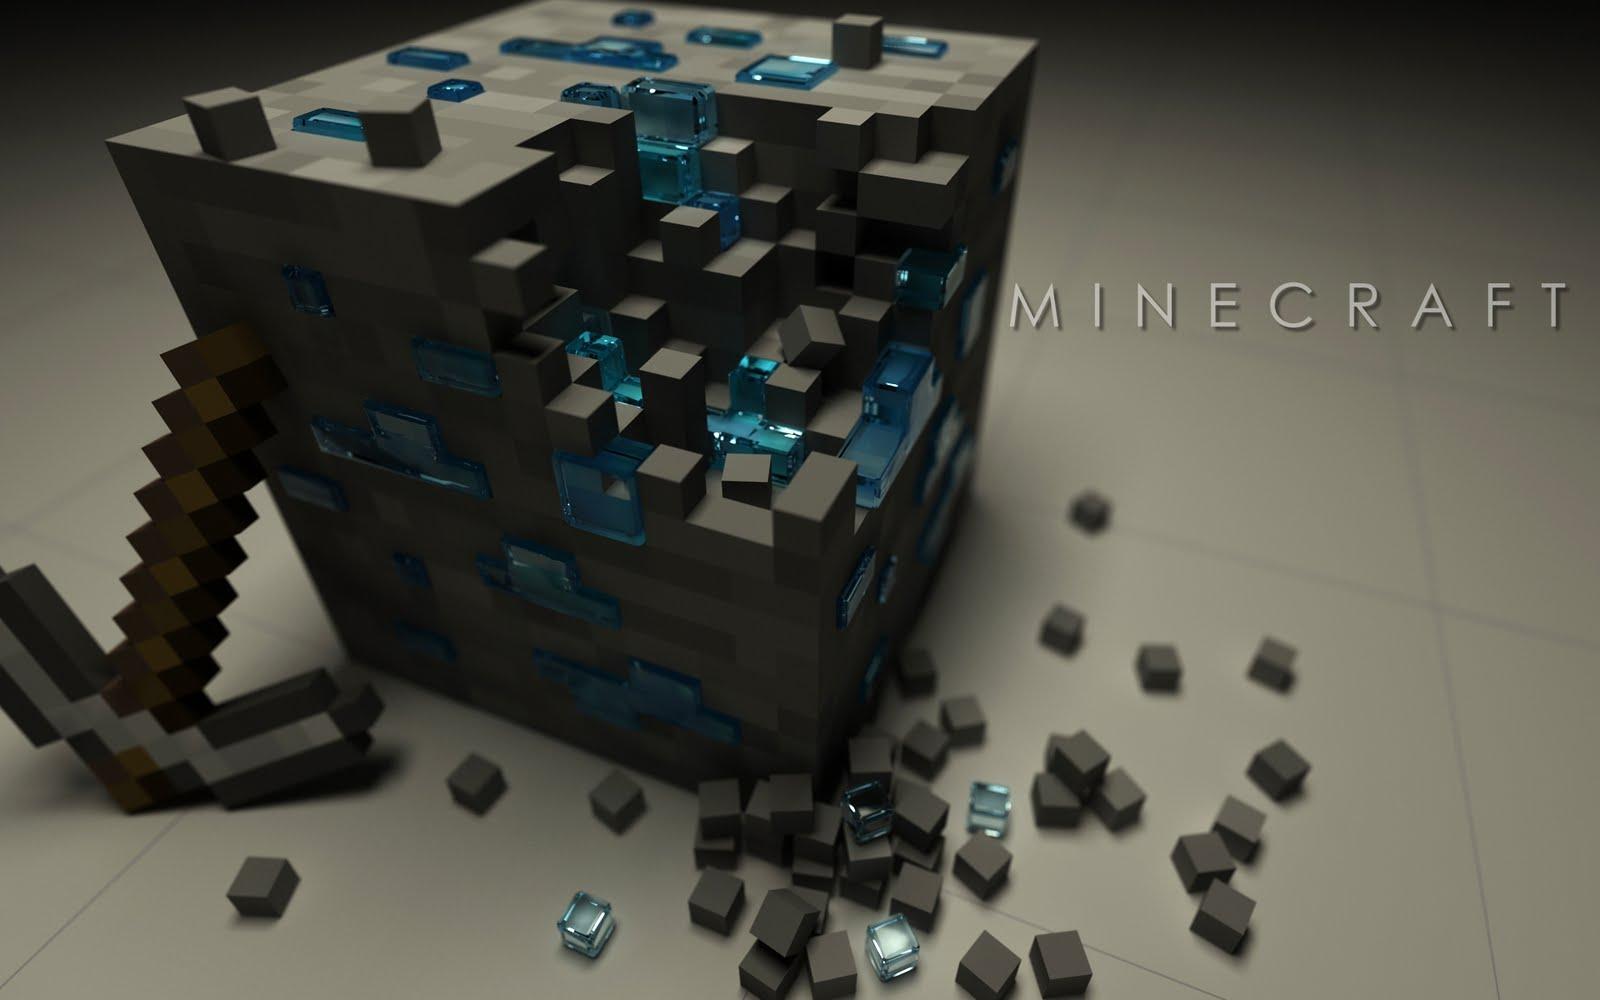 http://4.bp.blogspot.com/-3Eq41C5U8eU/Tbt42PWZ6XI/AAAAAAAAAD0/tHEbT-m2dYU/s1600/minecraft-wallpaper.jpg